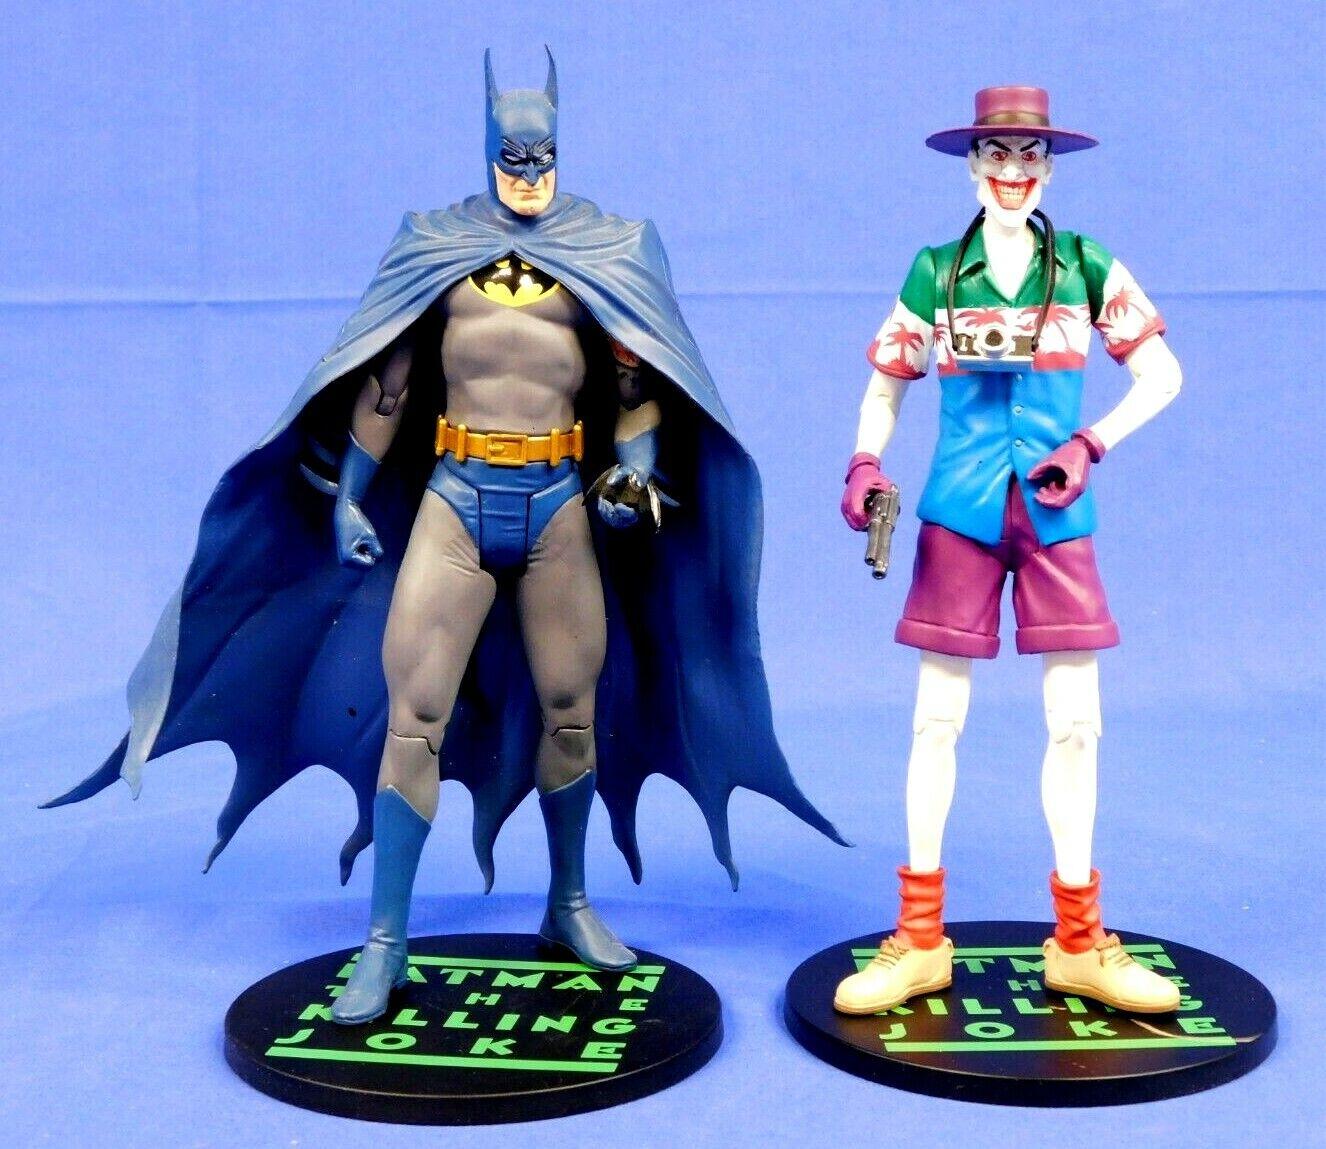 DC DIRECT BATMAN AND JOKER FIGURES FROM KILLING JOKE 2-PACK